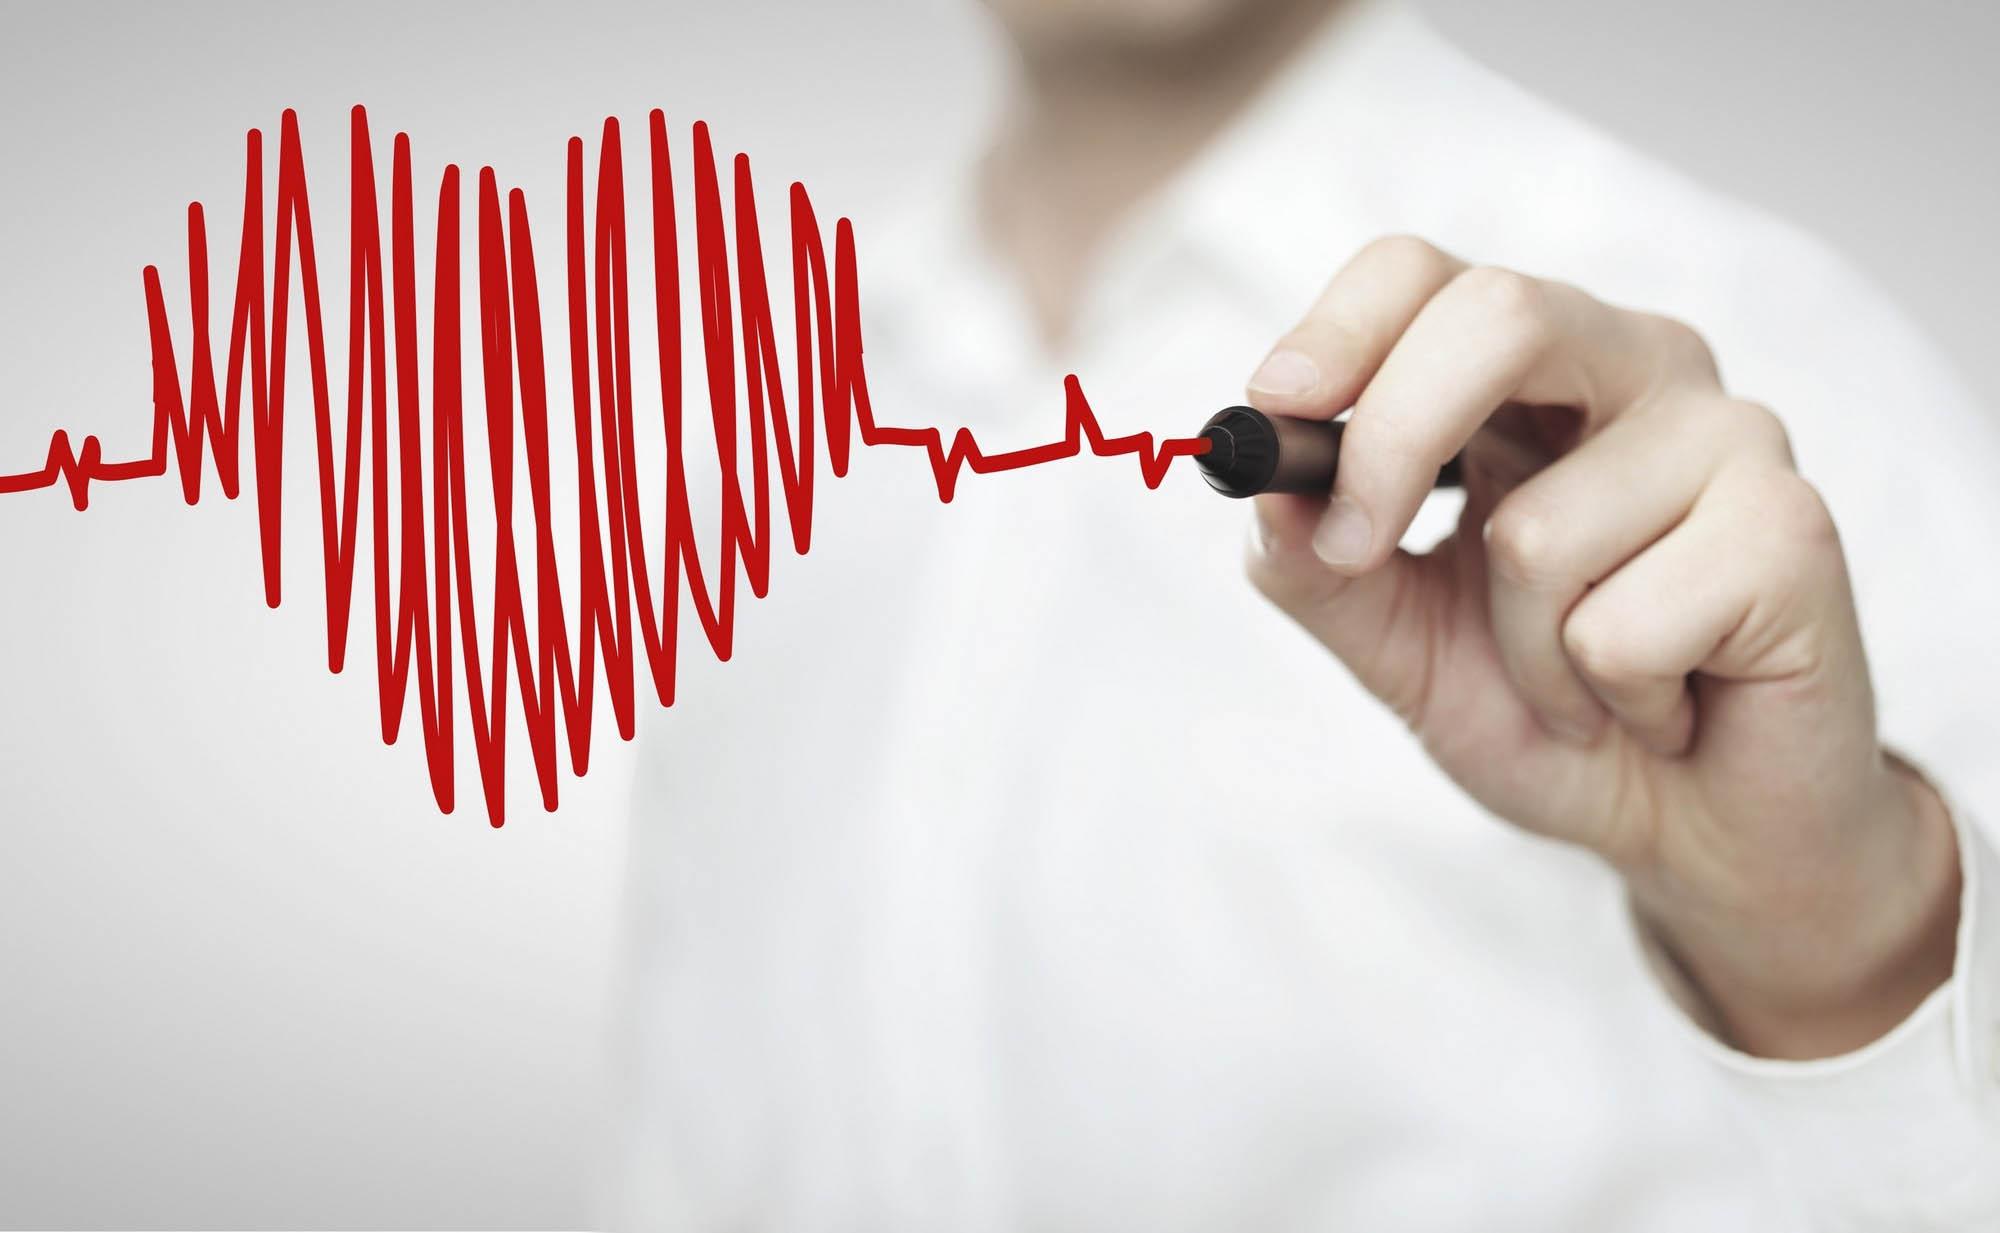 https://www.poliklinika-saric.com/wp-content/uploads/2016/04/slika-heartbeat.jpg